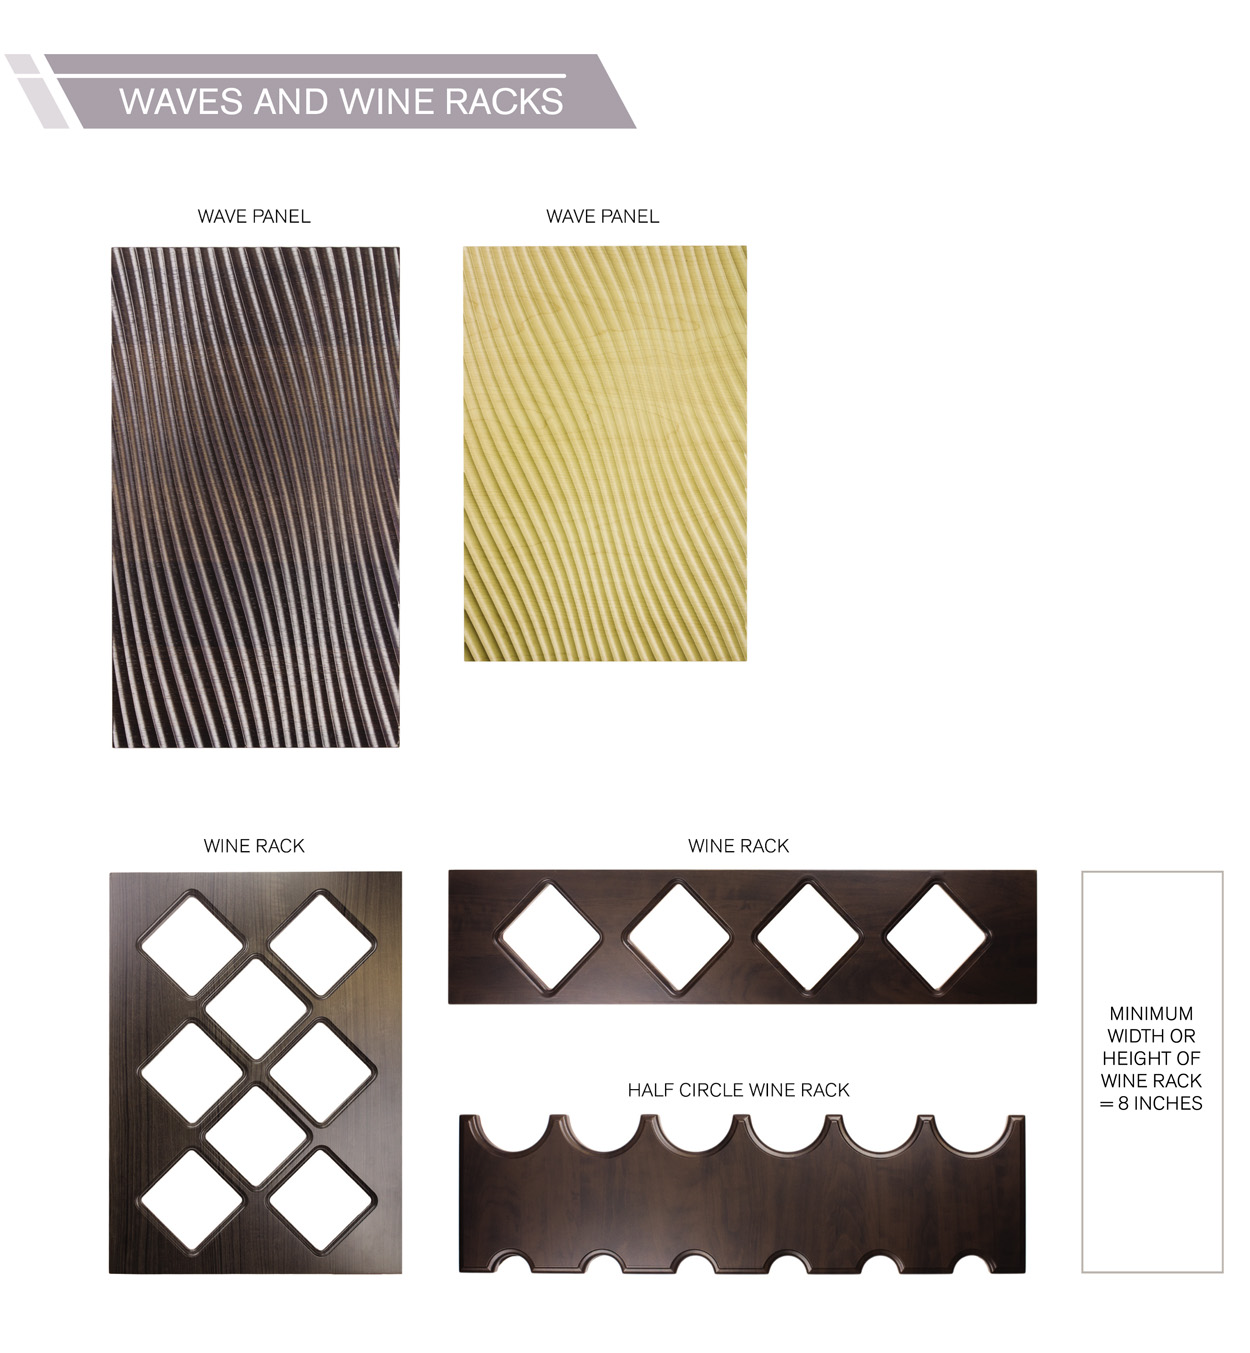 wave and w racks